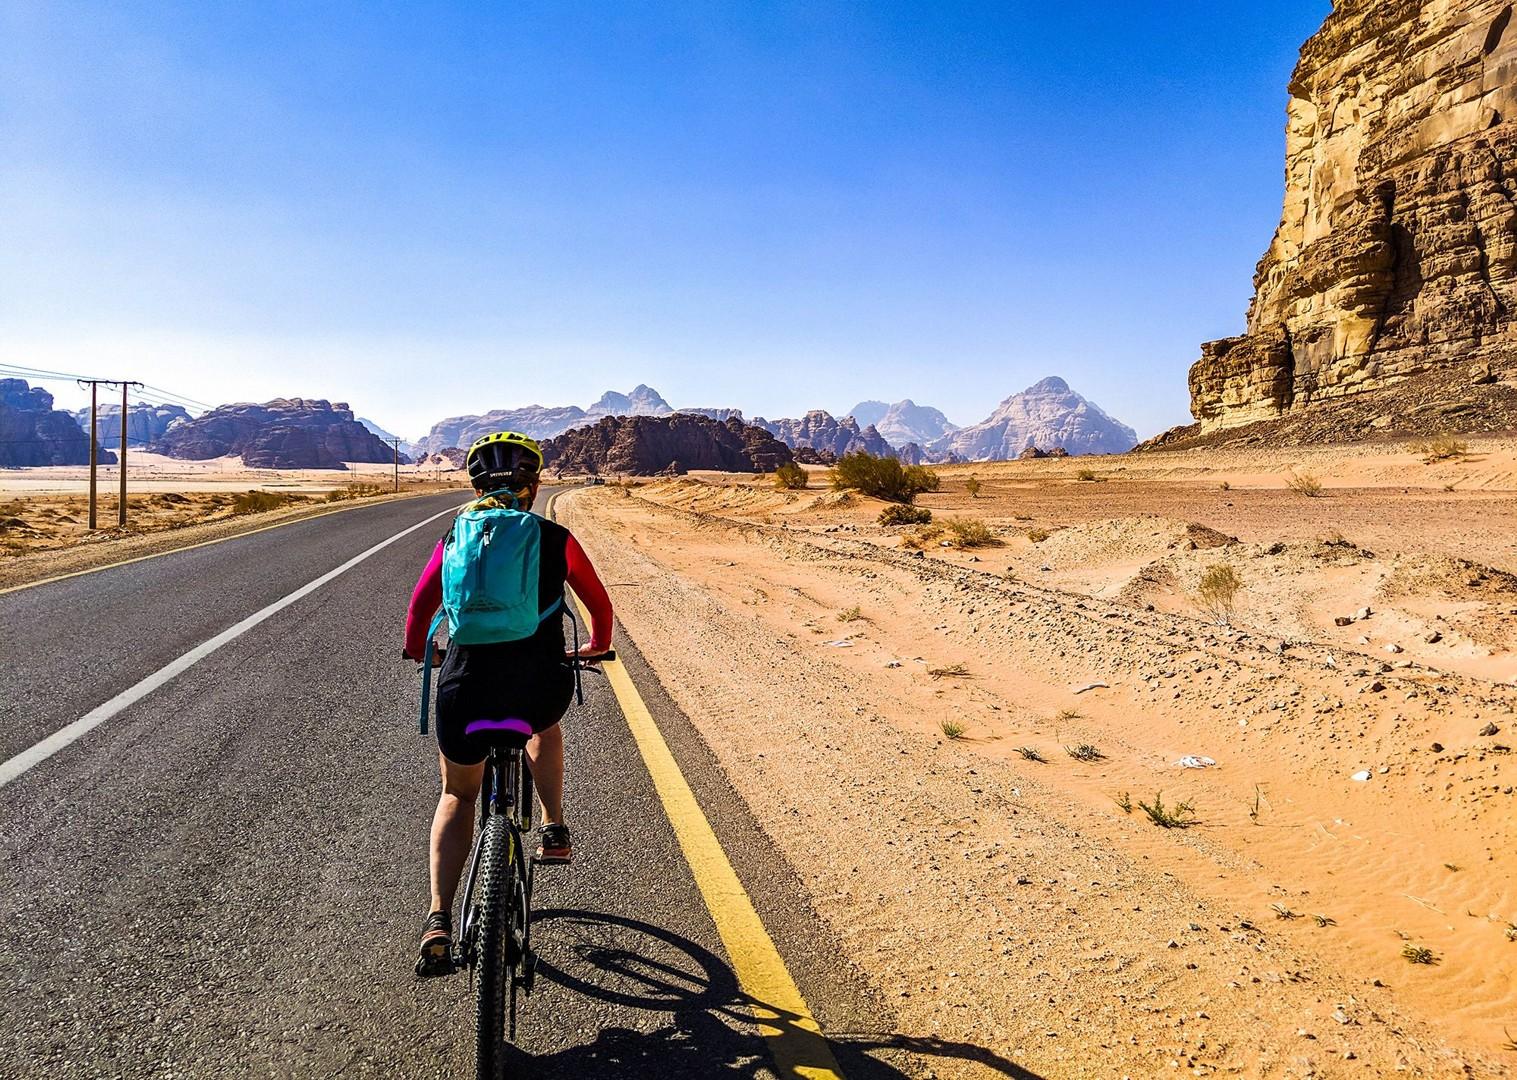 guided-cycling-adventure-in-jordan-skedaddle-biking.jpg - NEW! Jordan - Petra, Wadi Rum & the Dead Sea - Cycling Adventures